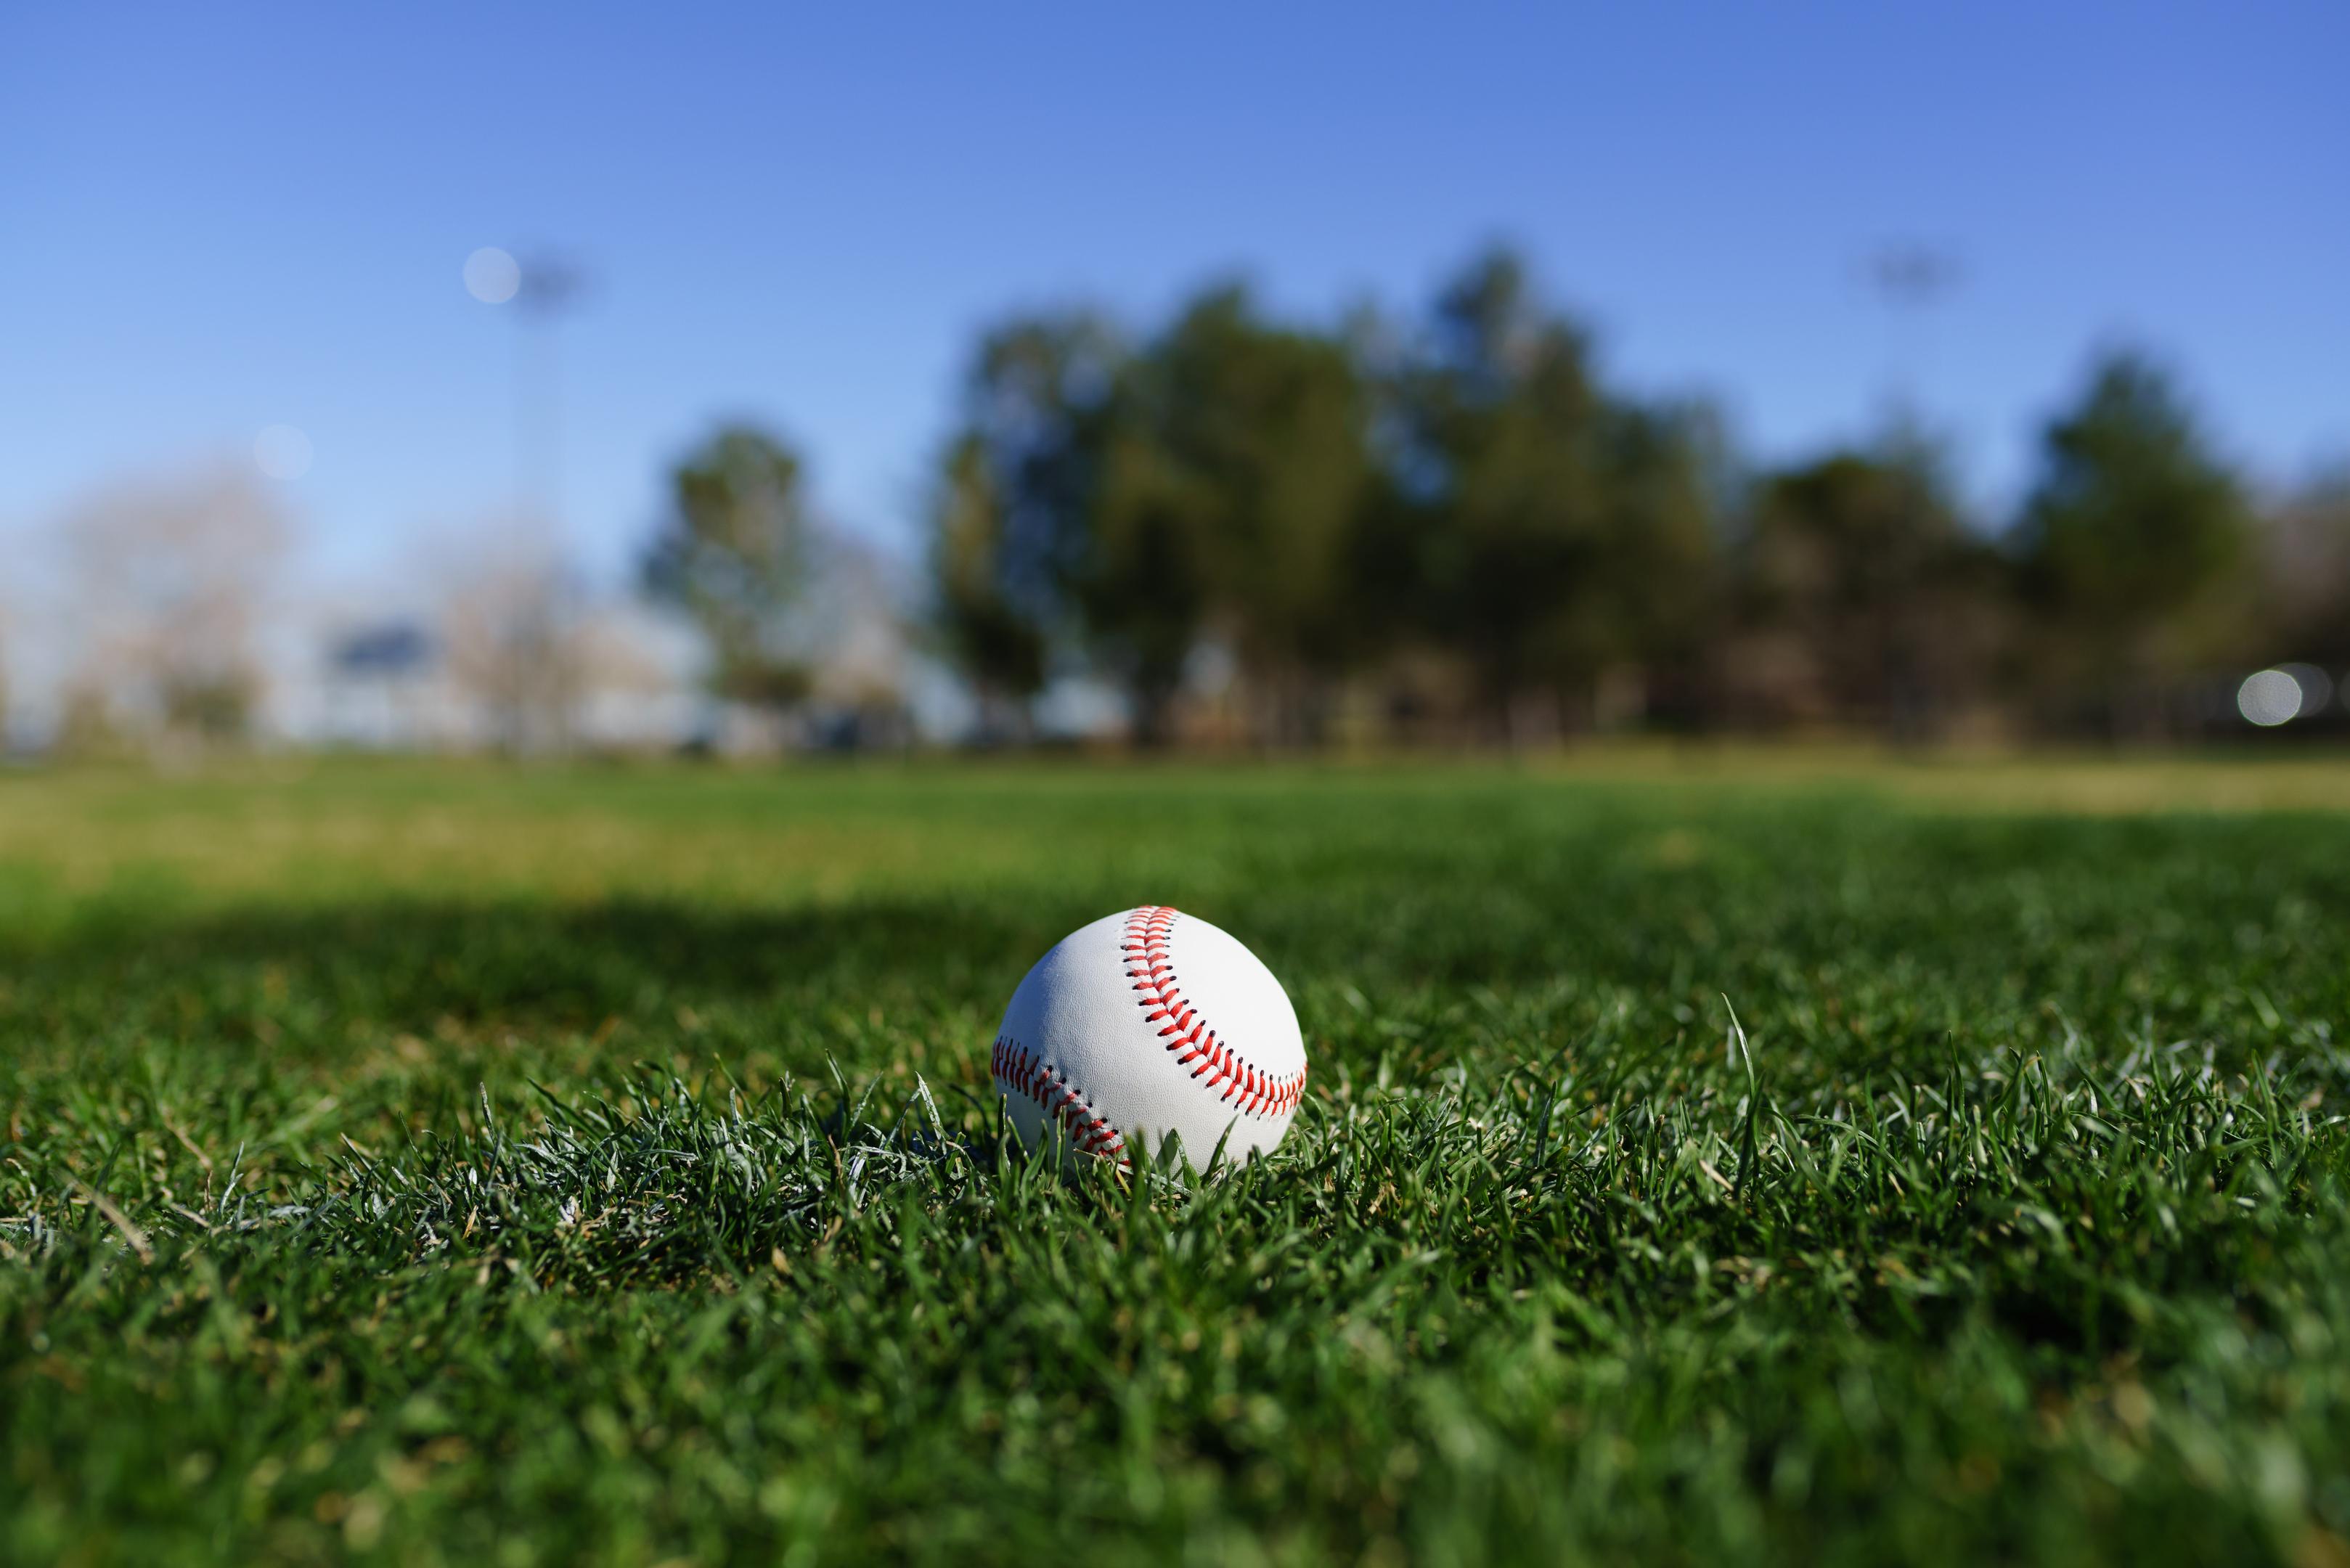 Pemex offers up baseball field